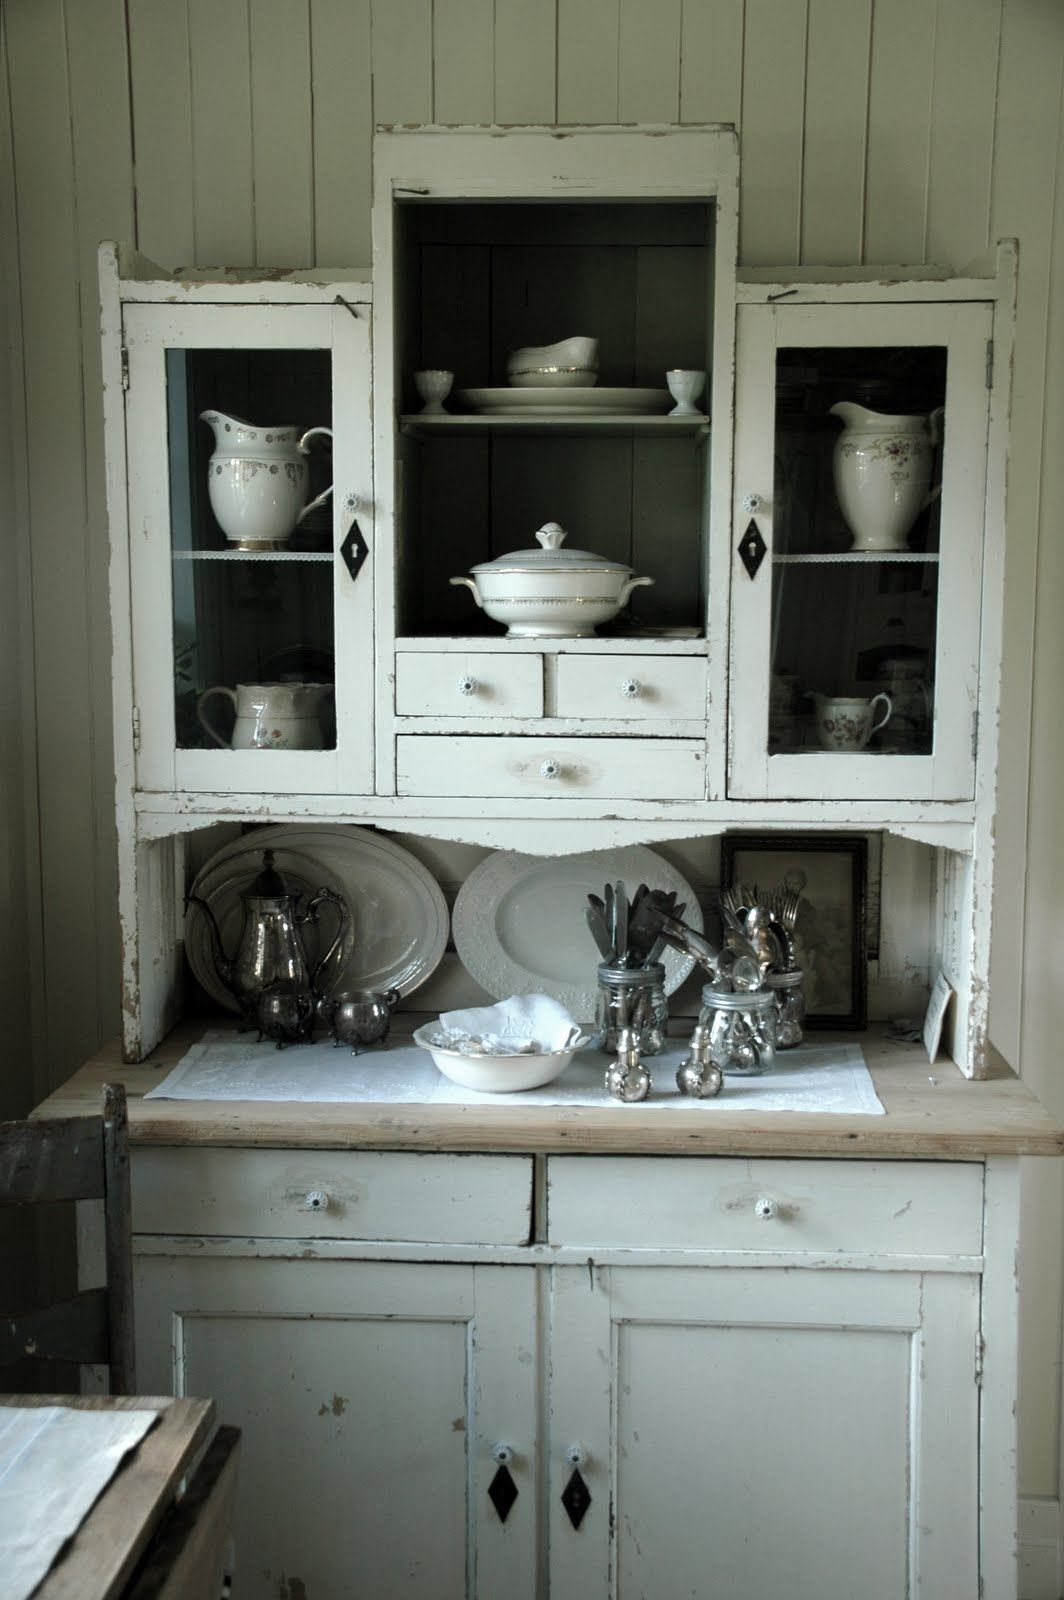 Frøken jægers hus chiedi aiuto pinterest cupboard shabby and